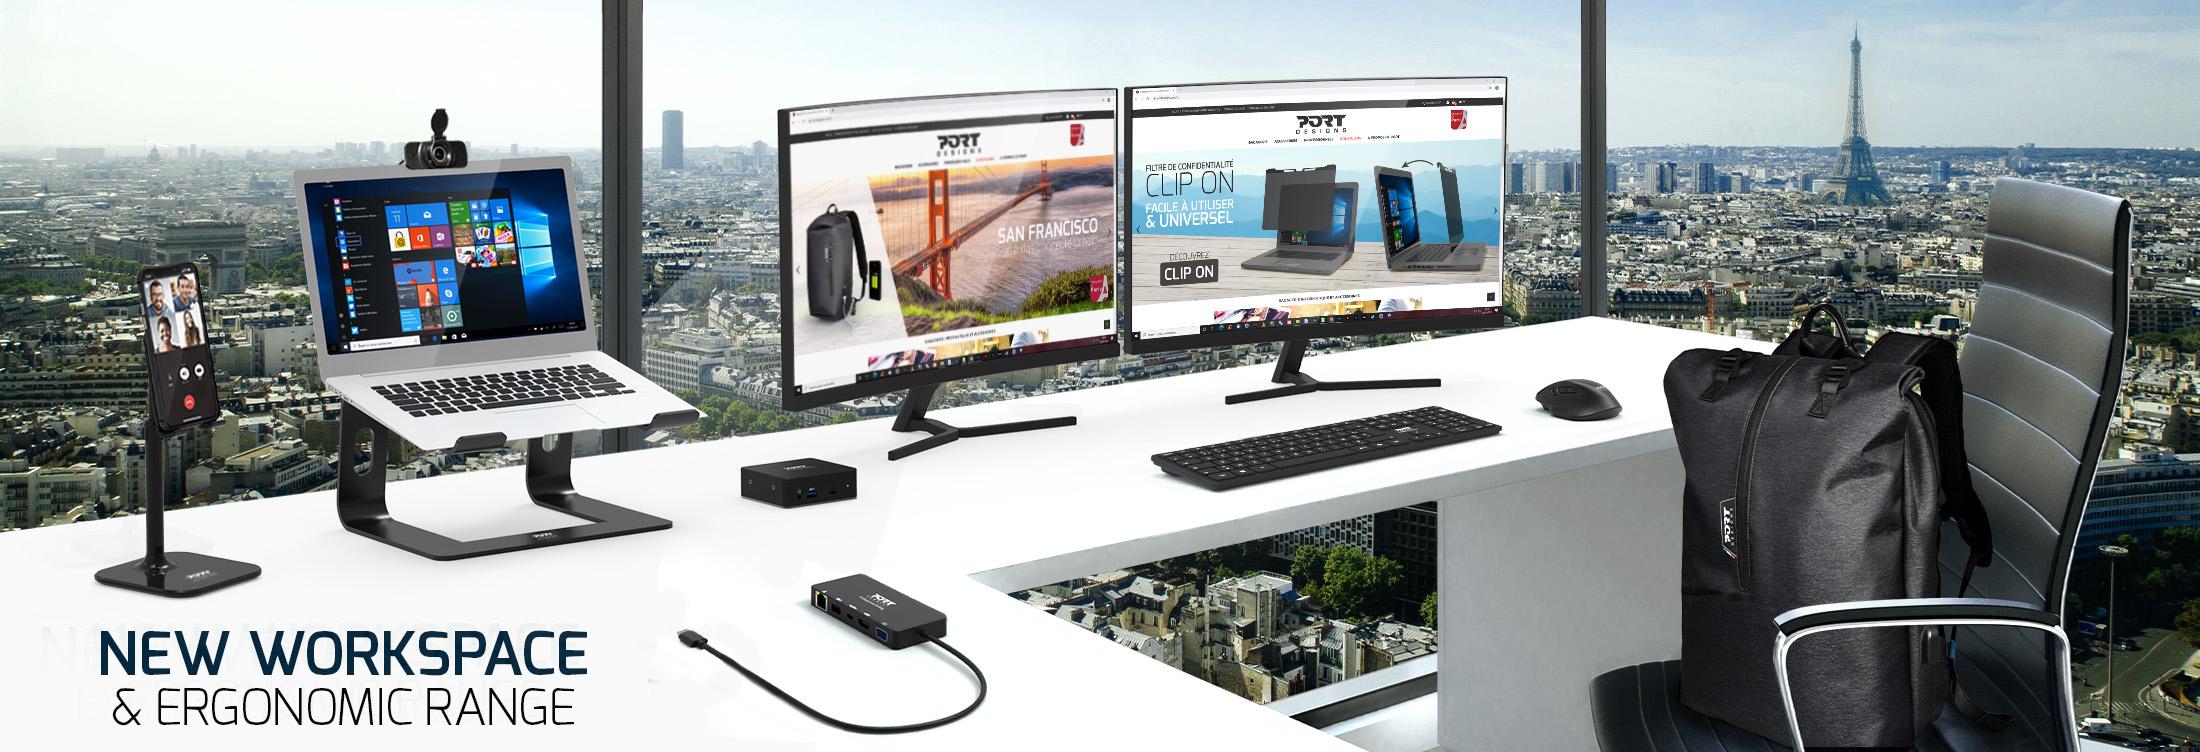 New workspace & ergonomic range